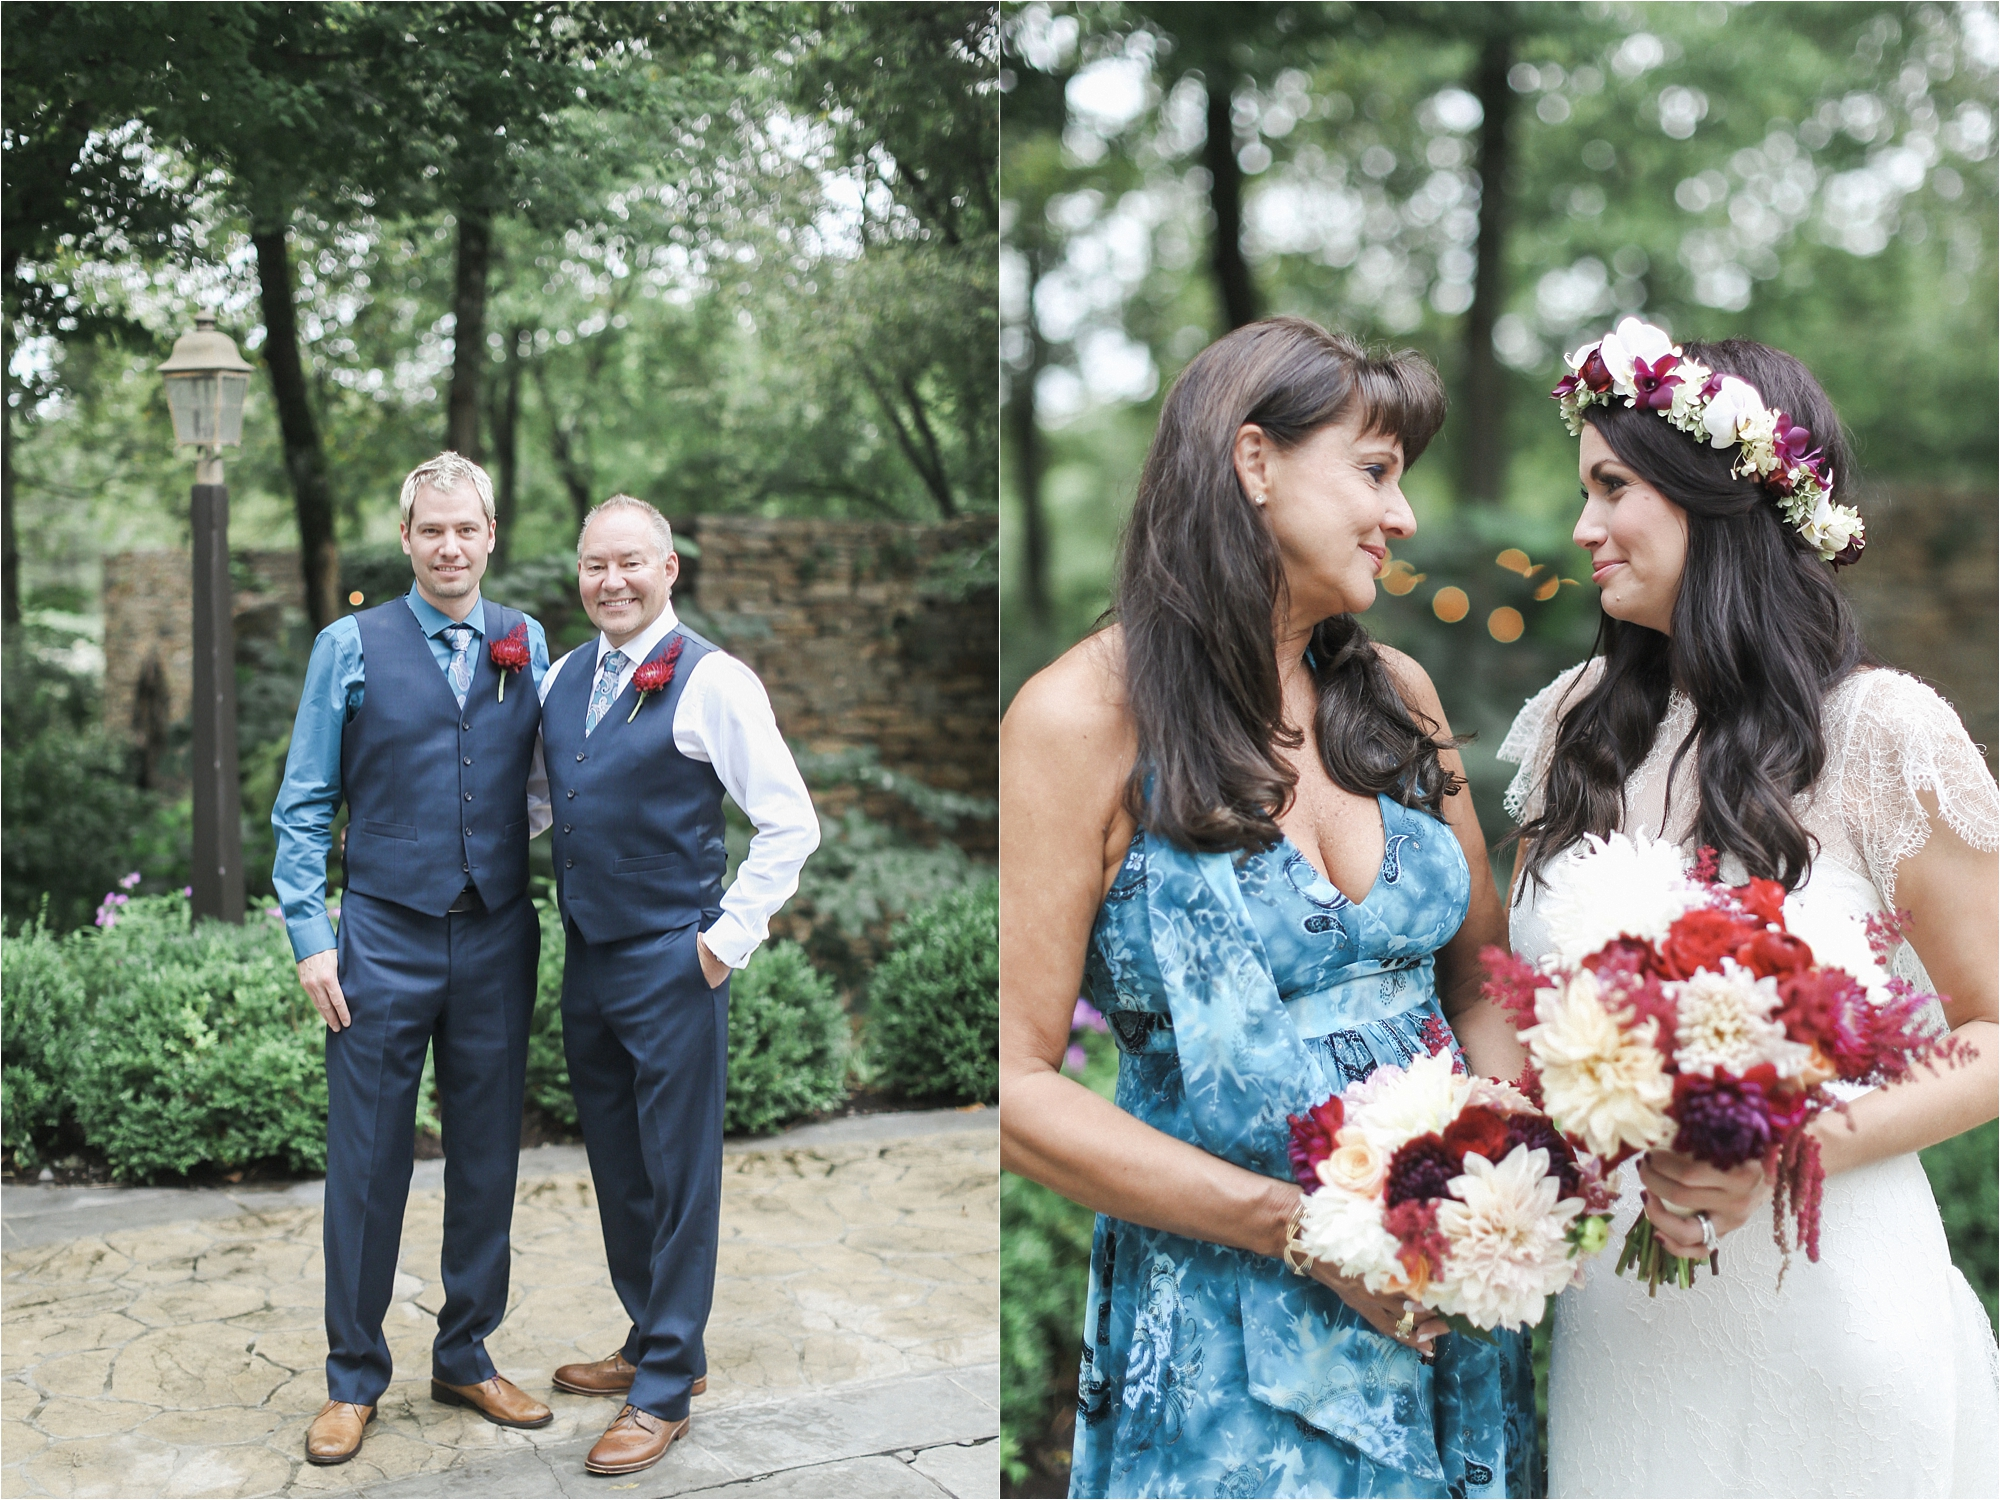 stephanie-yonce-photography-richmond-virginia-bohemian-outdoor-wedding-photo_0023.jpg